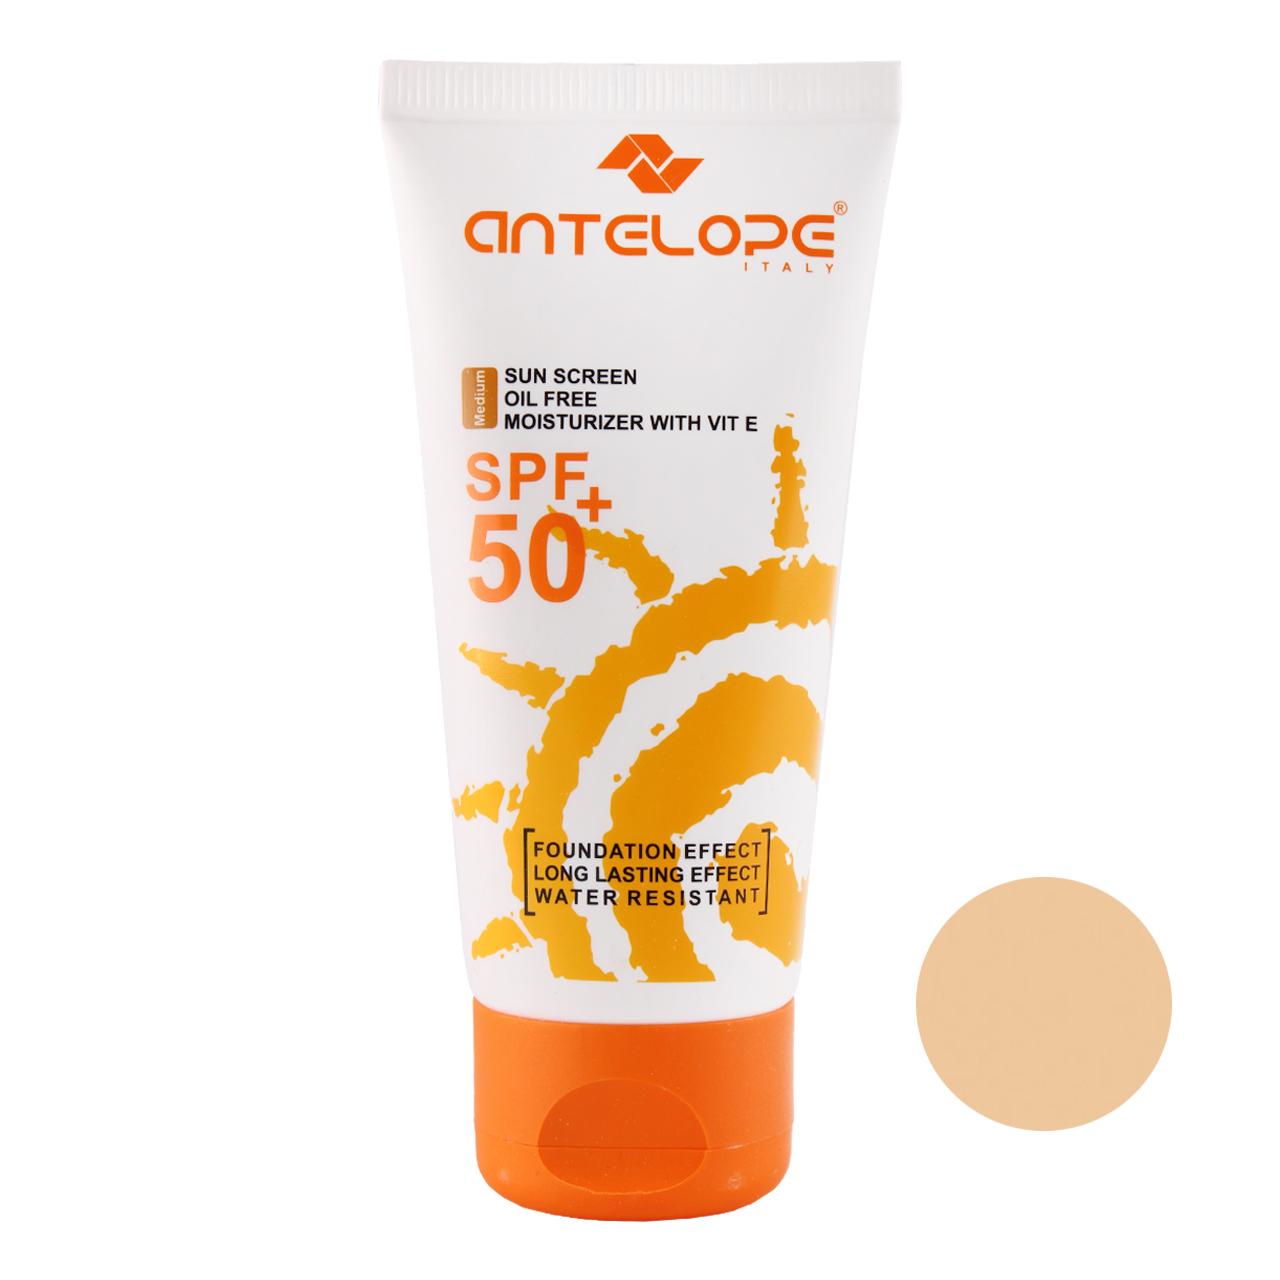 قیمت کرم ضد آفتاب  پوست چرب آنته لوپه حاوی ویتامین E مدل Oil Free Vit E رنگ بژ طبیعی حجم 50 میلی لیتر